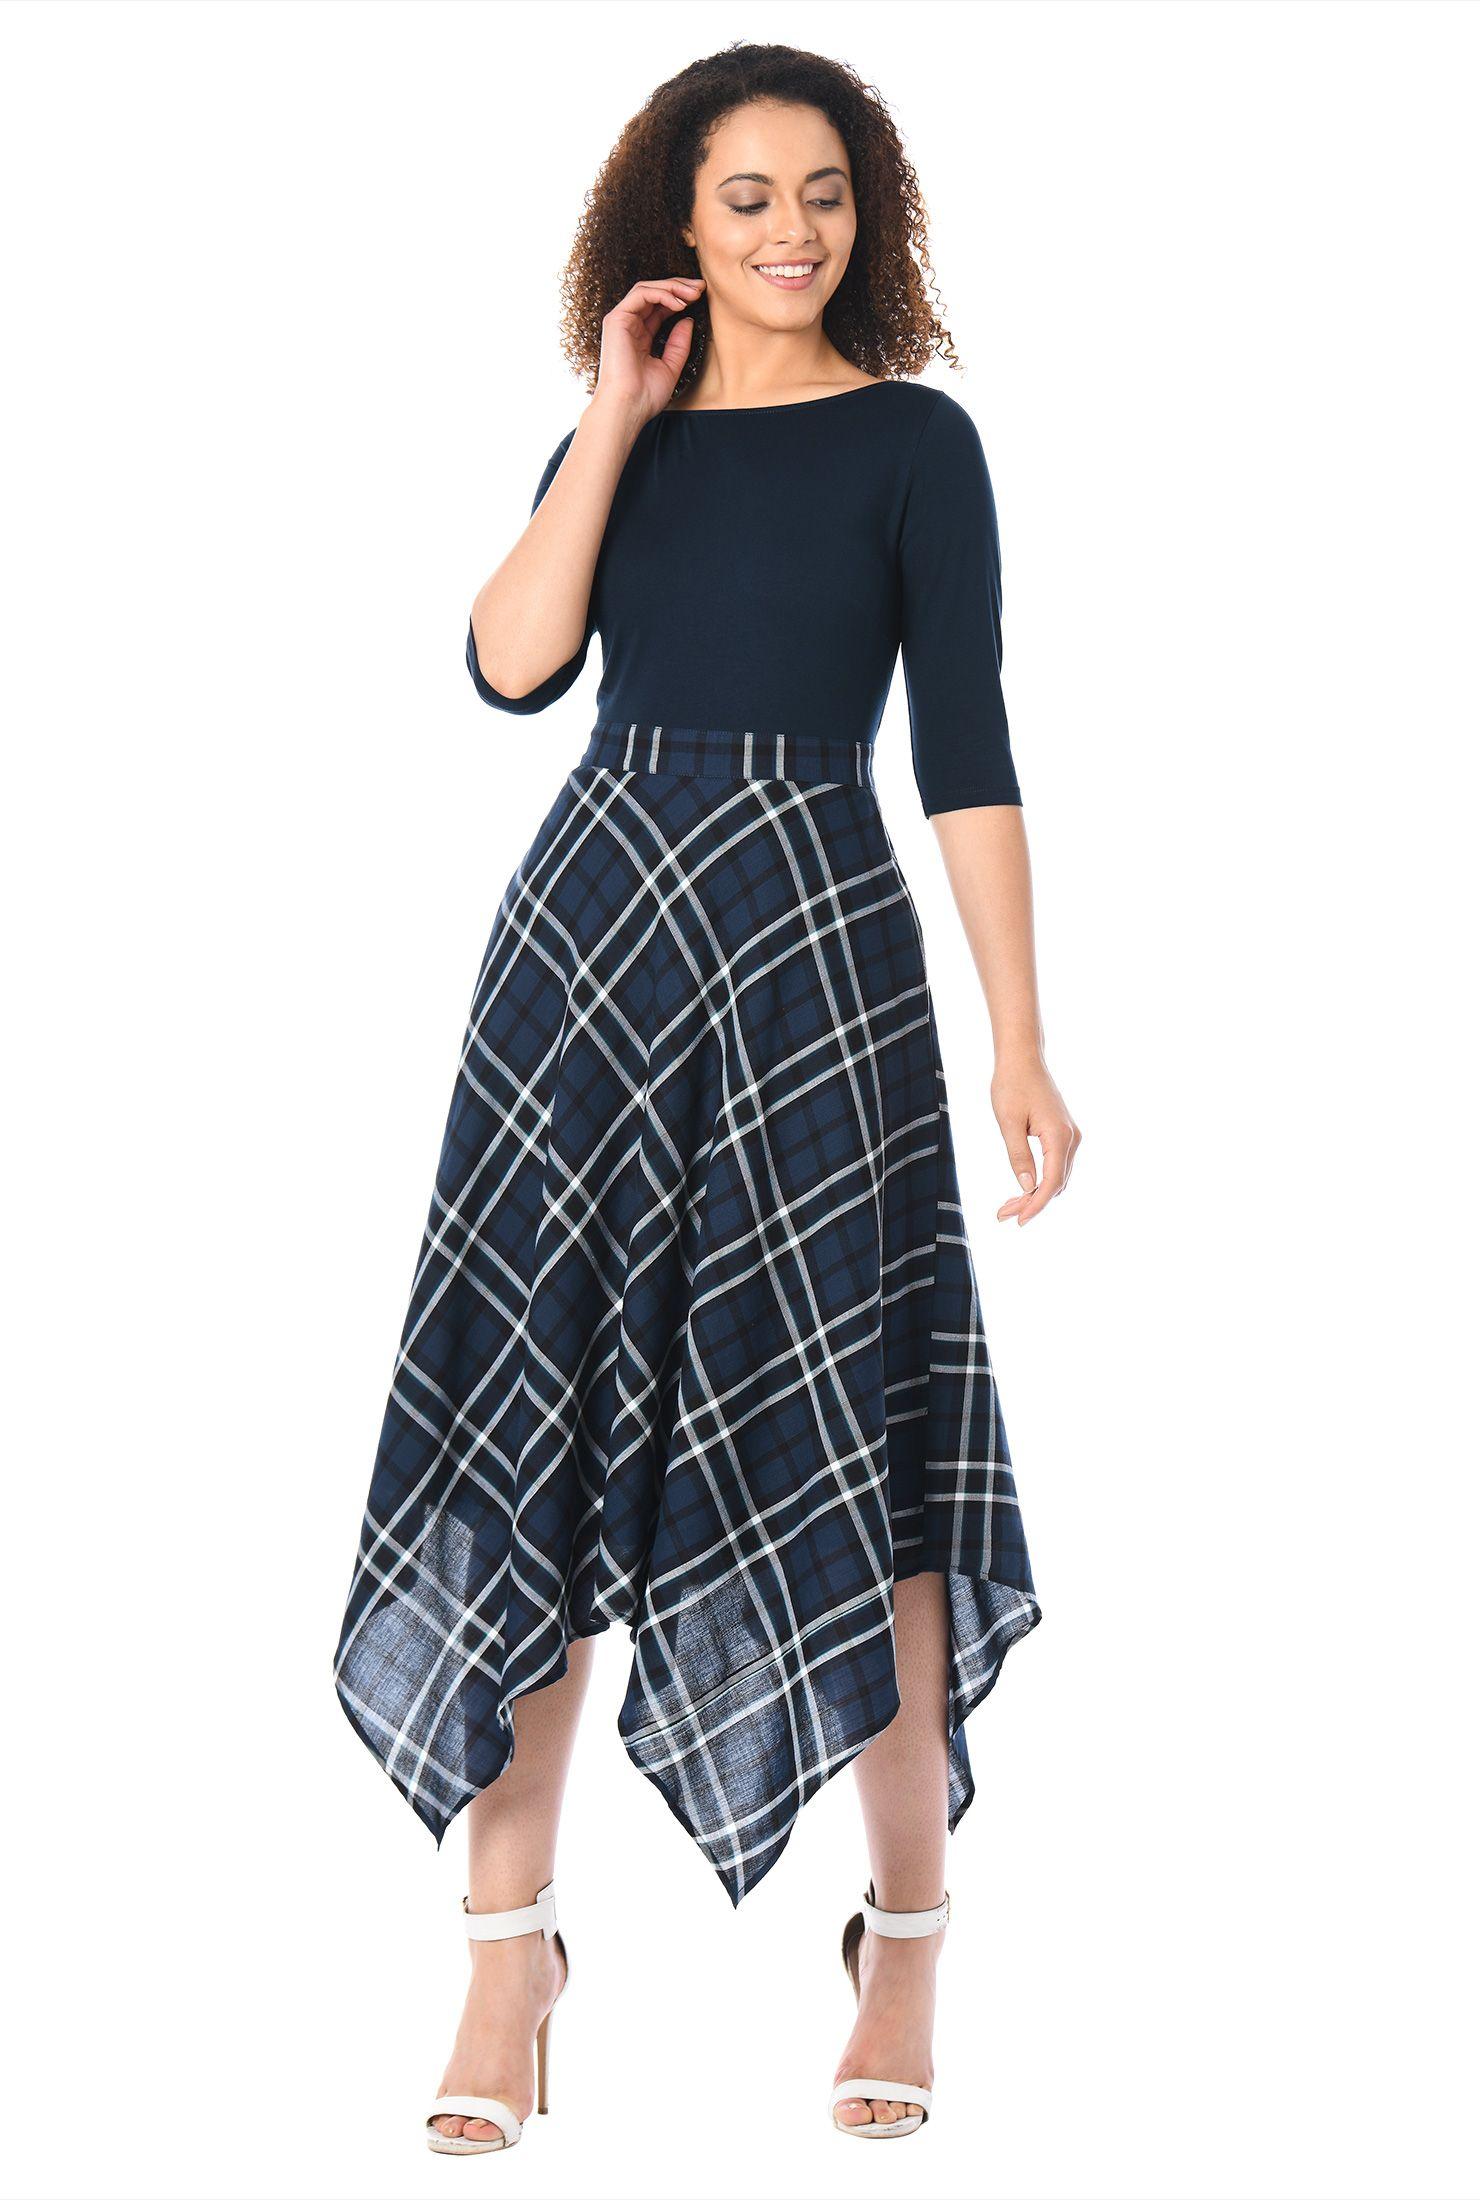 92bc7850a8f eShakti Fashion: Designer Dresses, Designer Tops and Designer Skirts · Womens  Fashion Designers